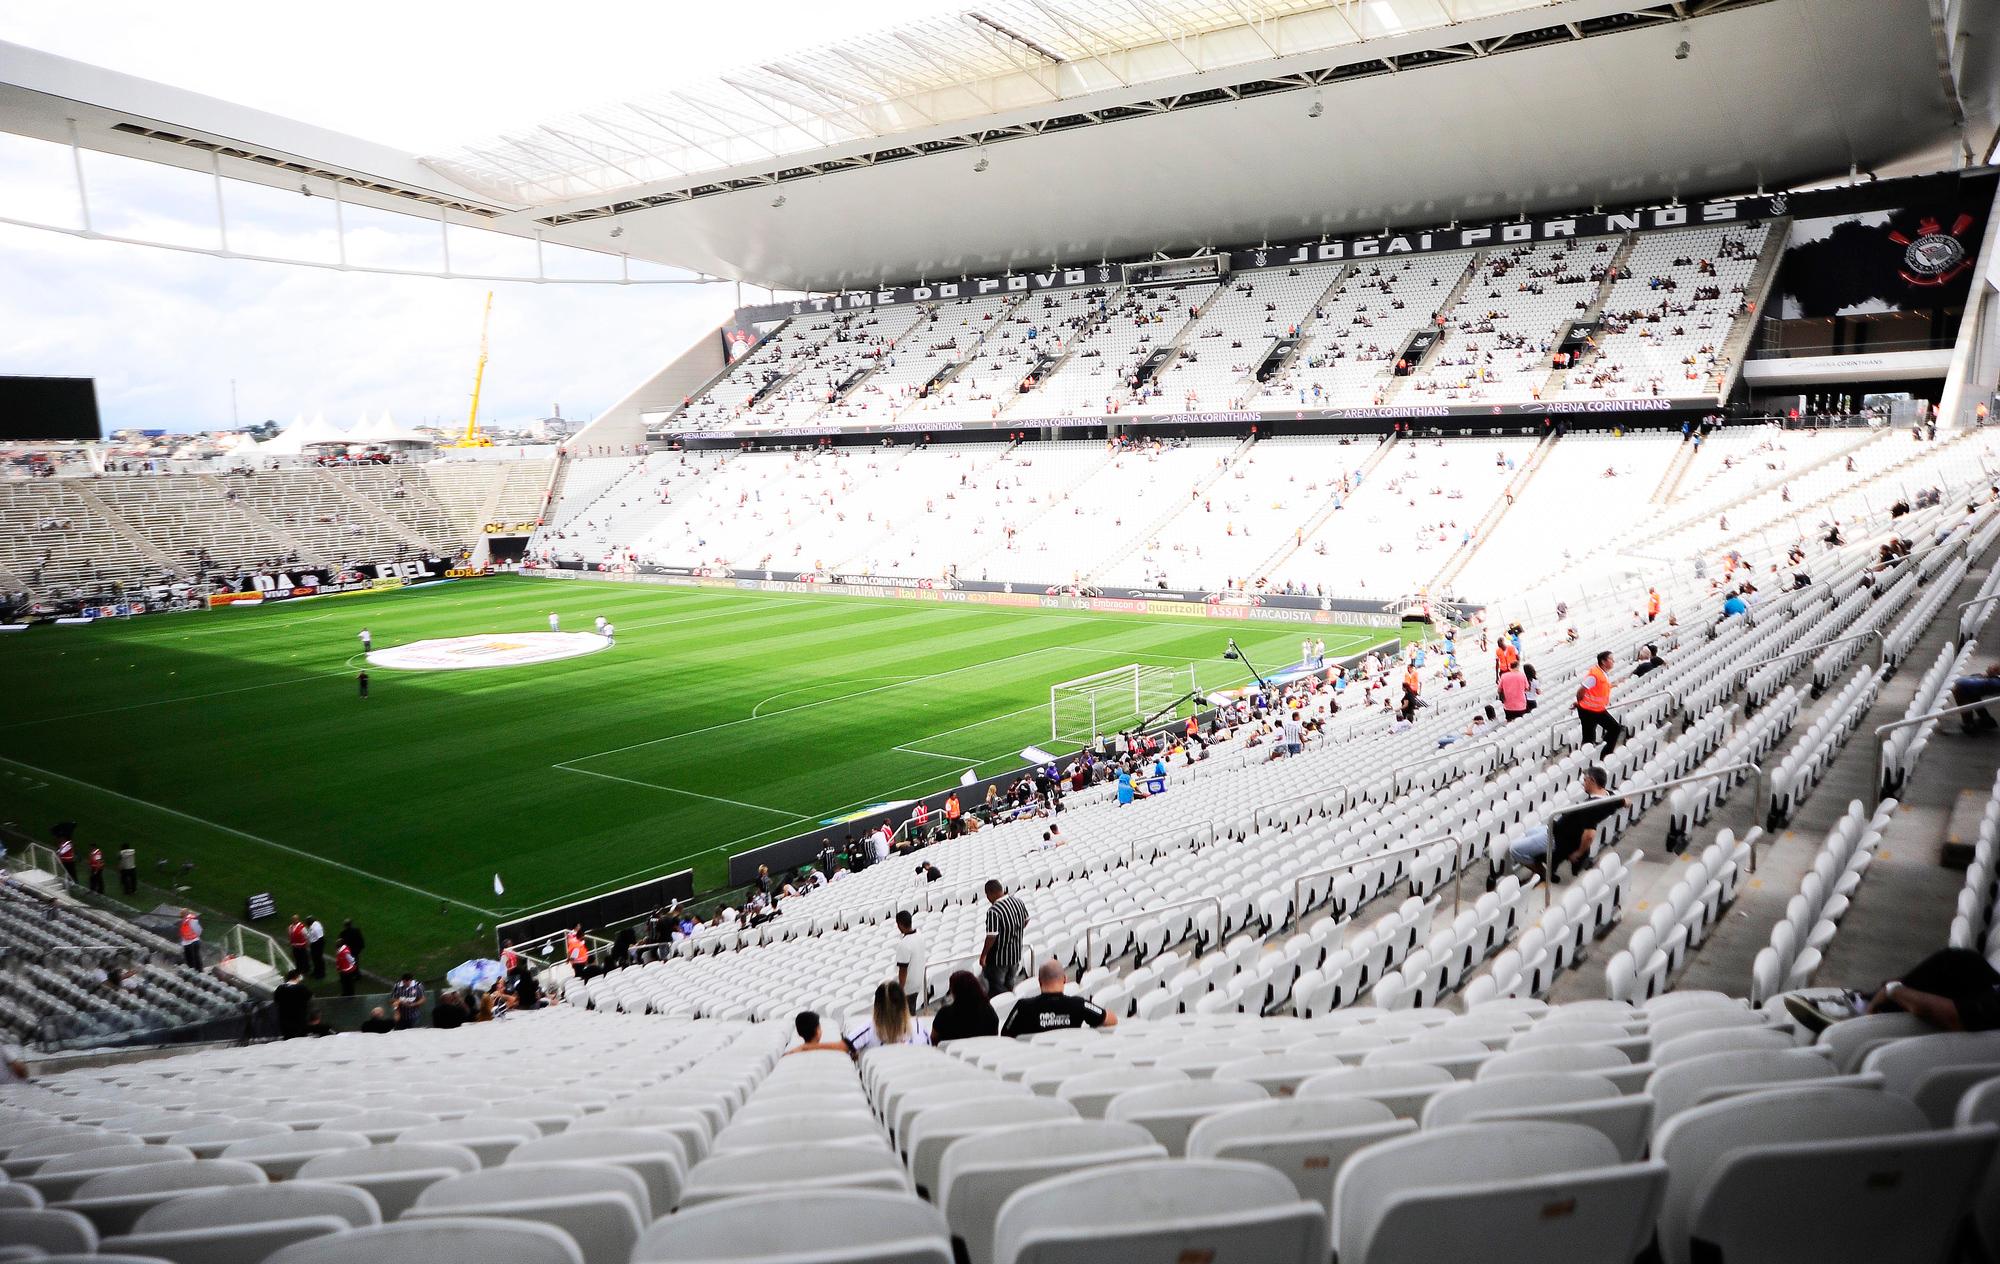 Corinthians VS Coritiba ( BETTING TIPS, Match Preview & Expert Analysis )